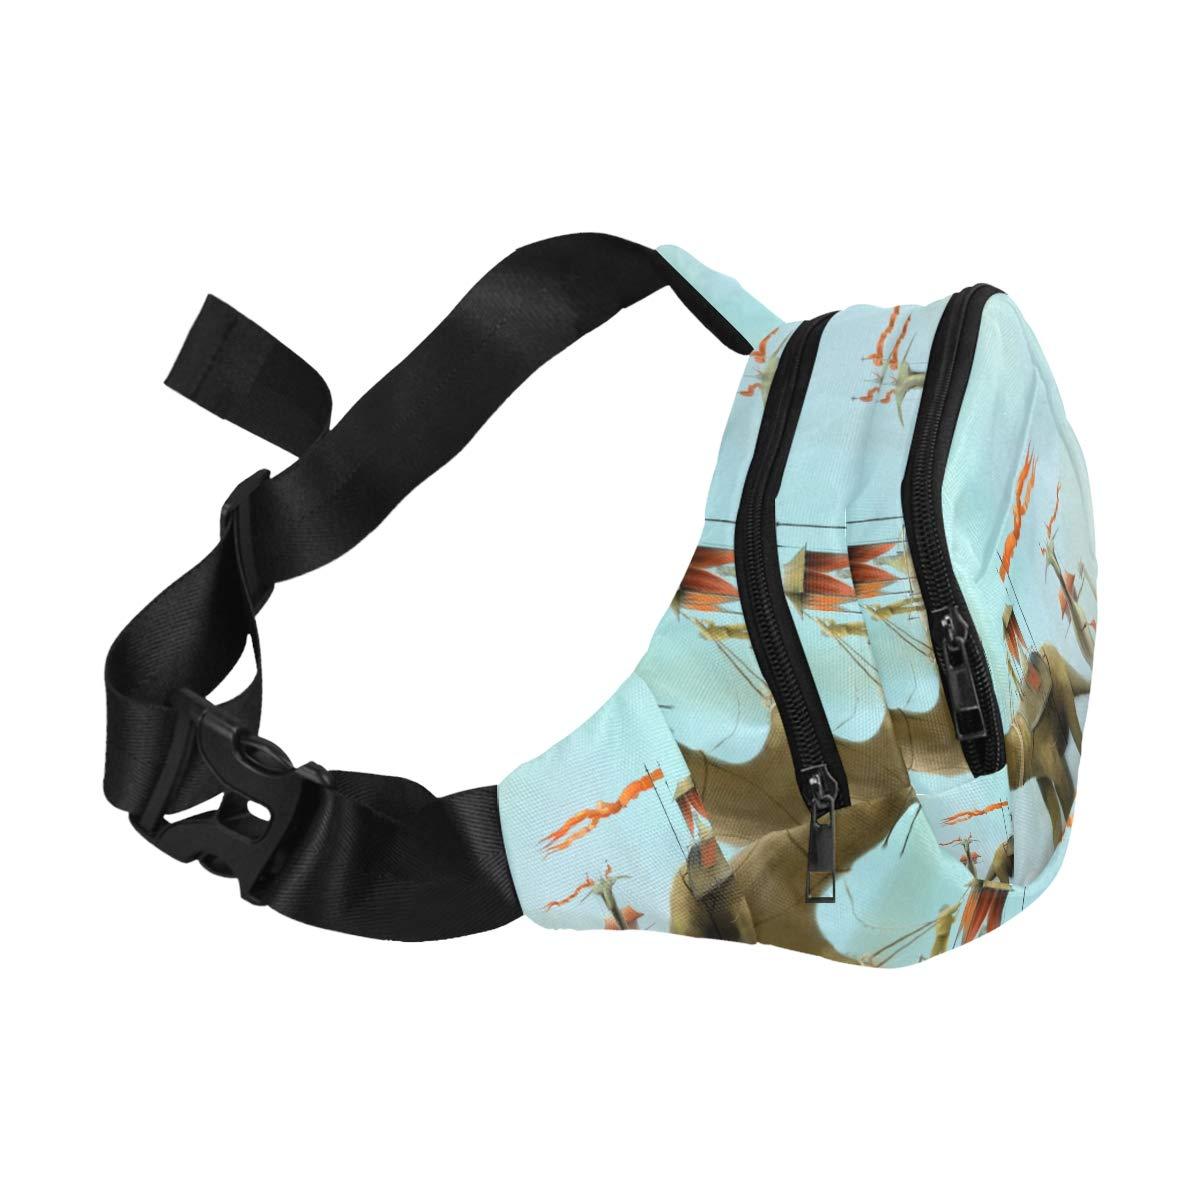 Fierce And Interesting Dinosaur Fenny Packs Waist Bags Adjustable Belt Waterproof Nylon Travel Running Sport Vacation Party For Men Women Boys Girls Kids